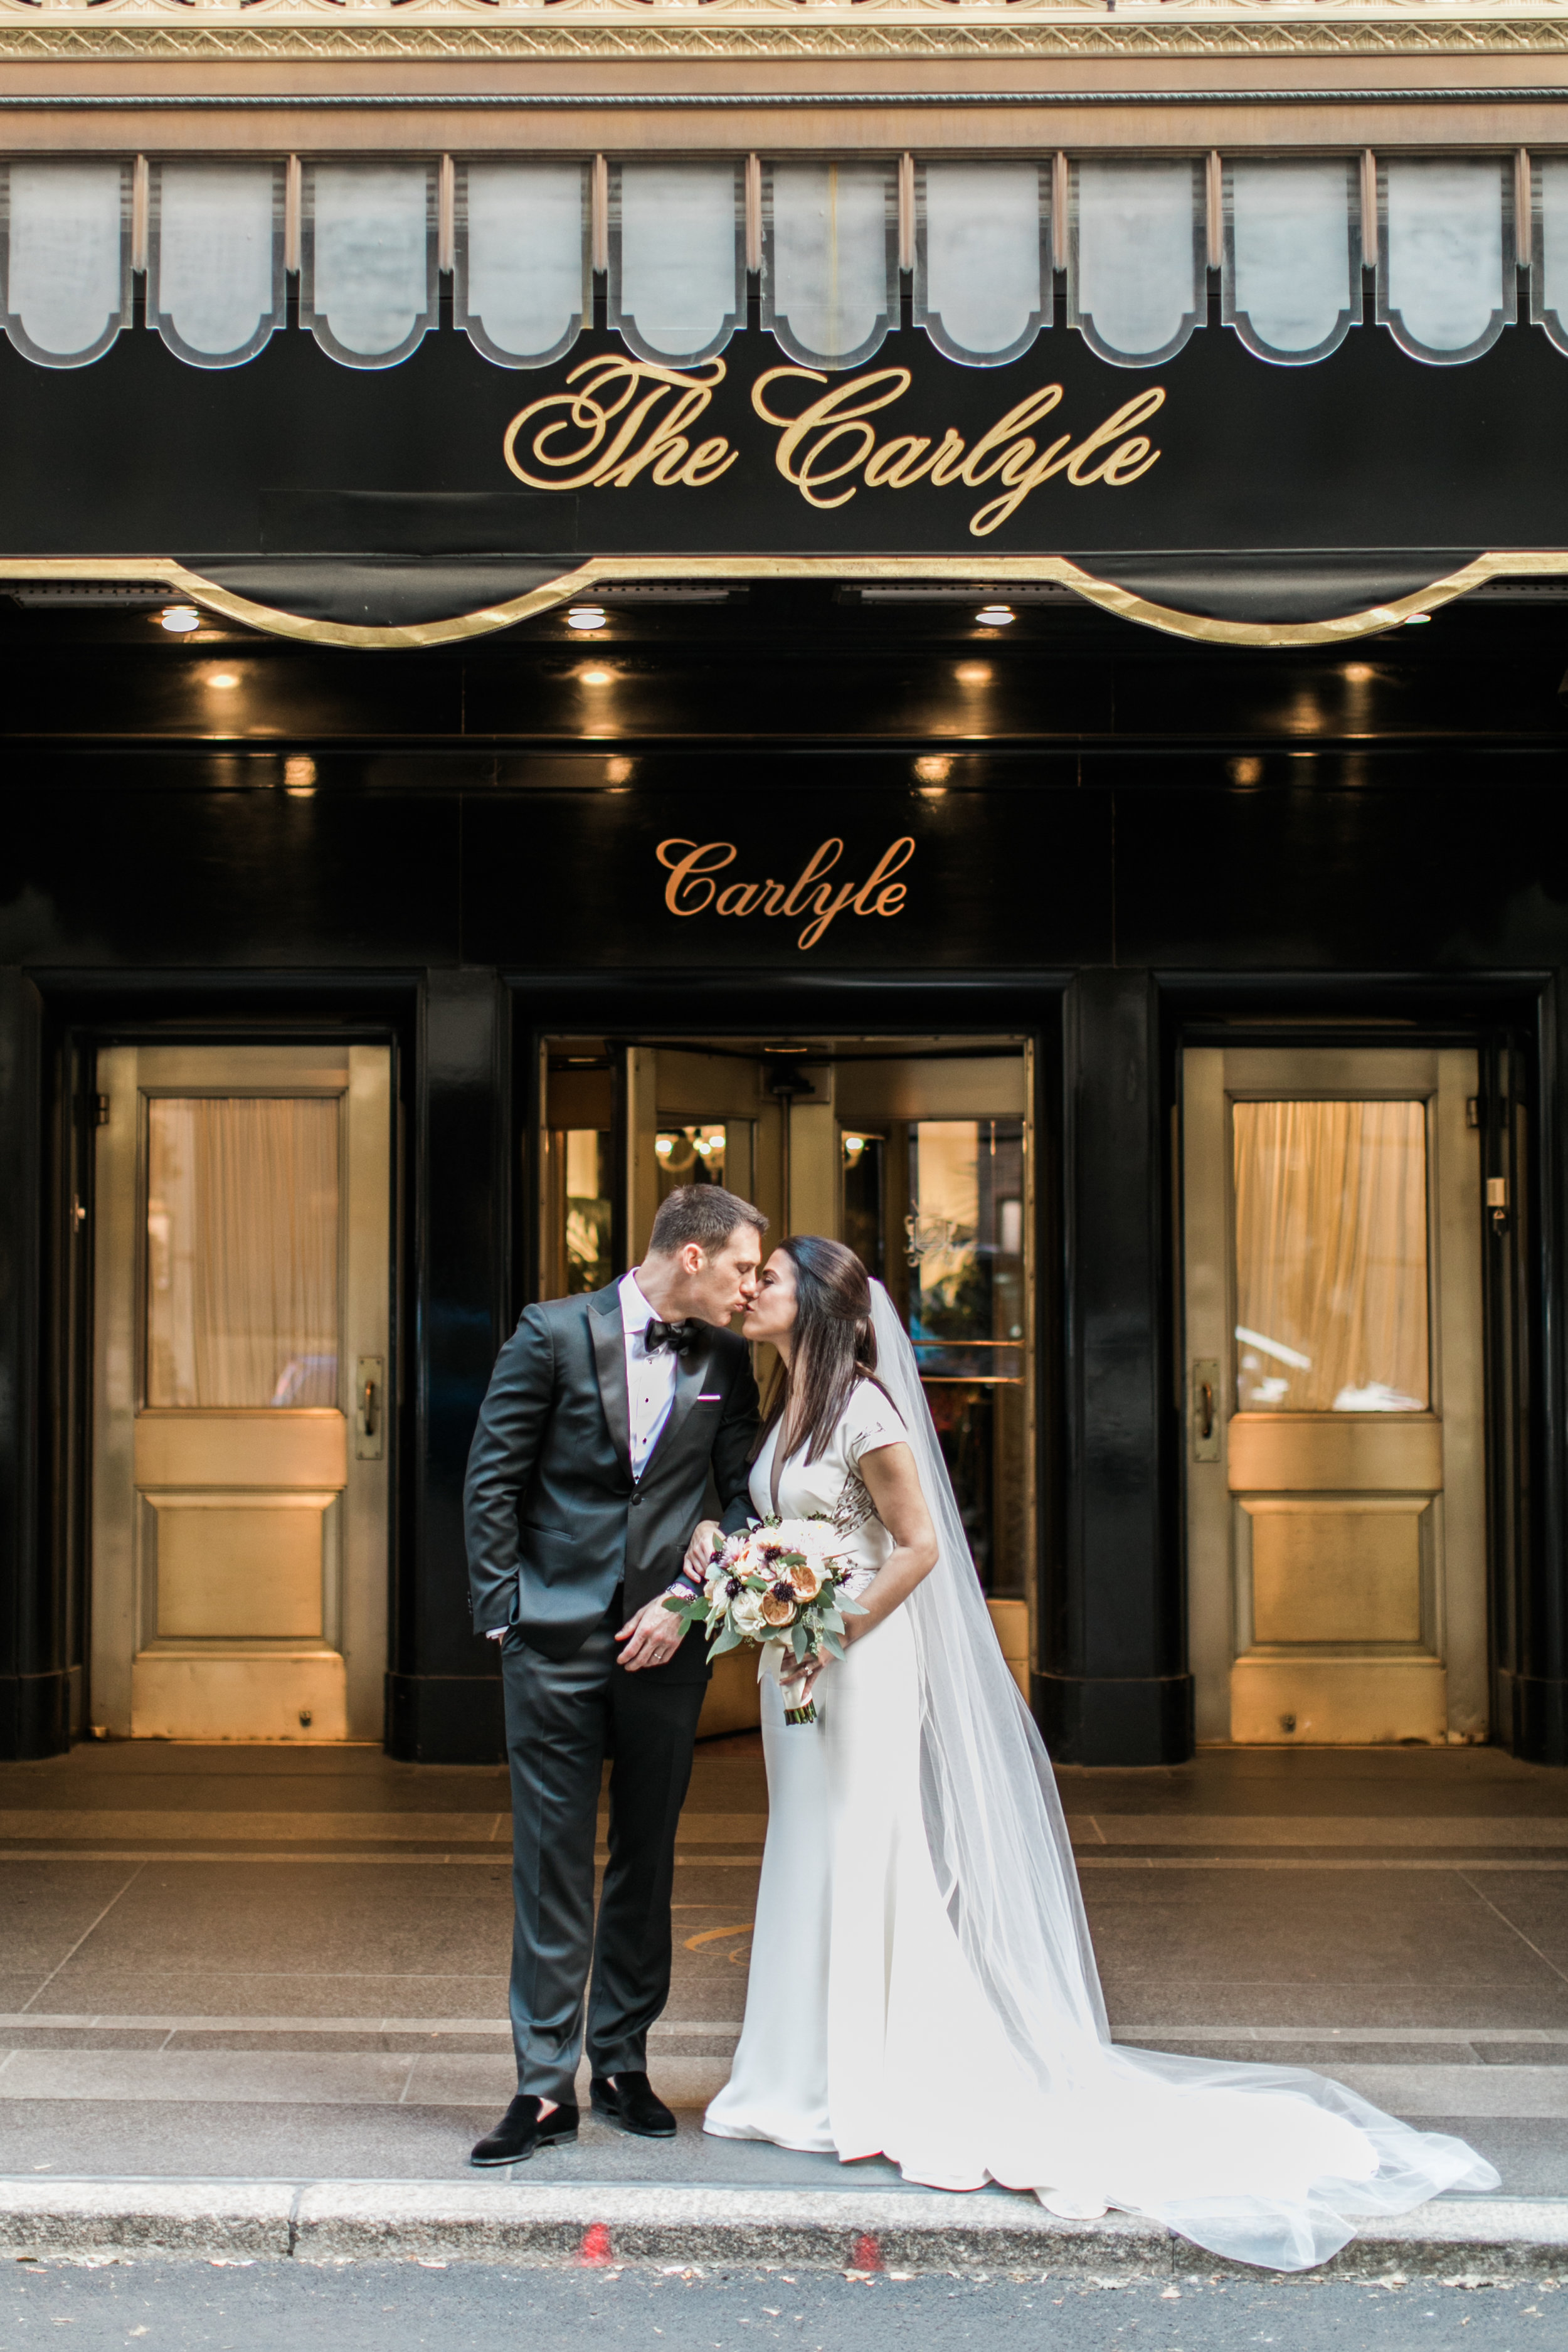 the-carlyle-wedding-photographer44.jpg